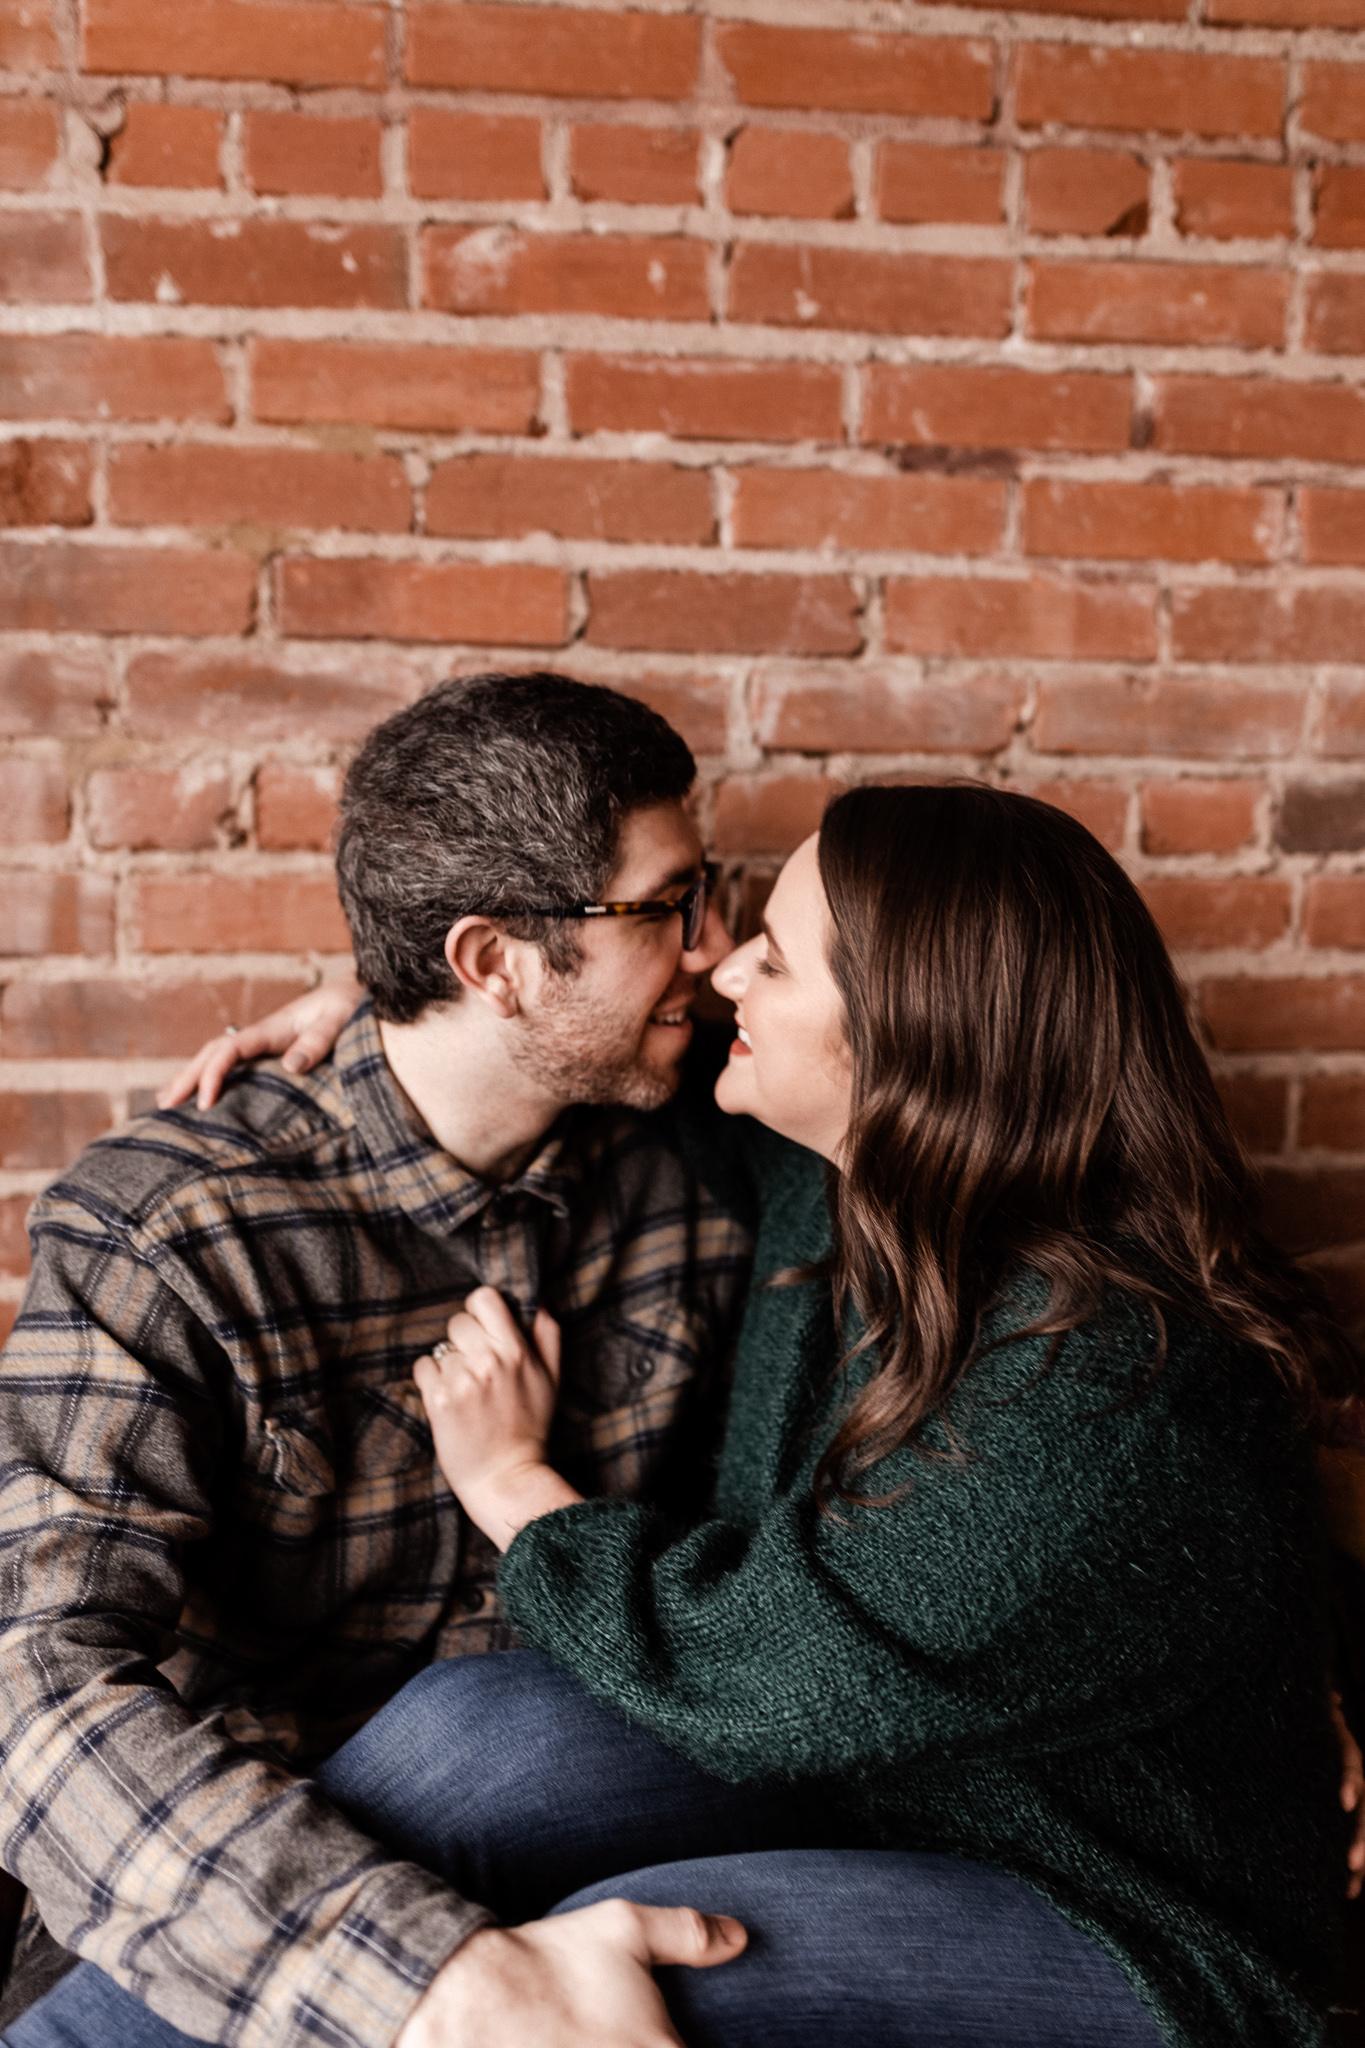 Seamus + Lauren | Modern Downtown Engagements | Oklahoma Wedding Photographer-8.jpg